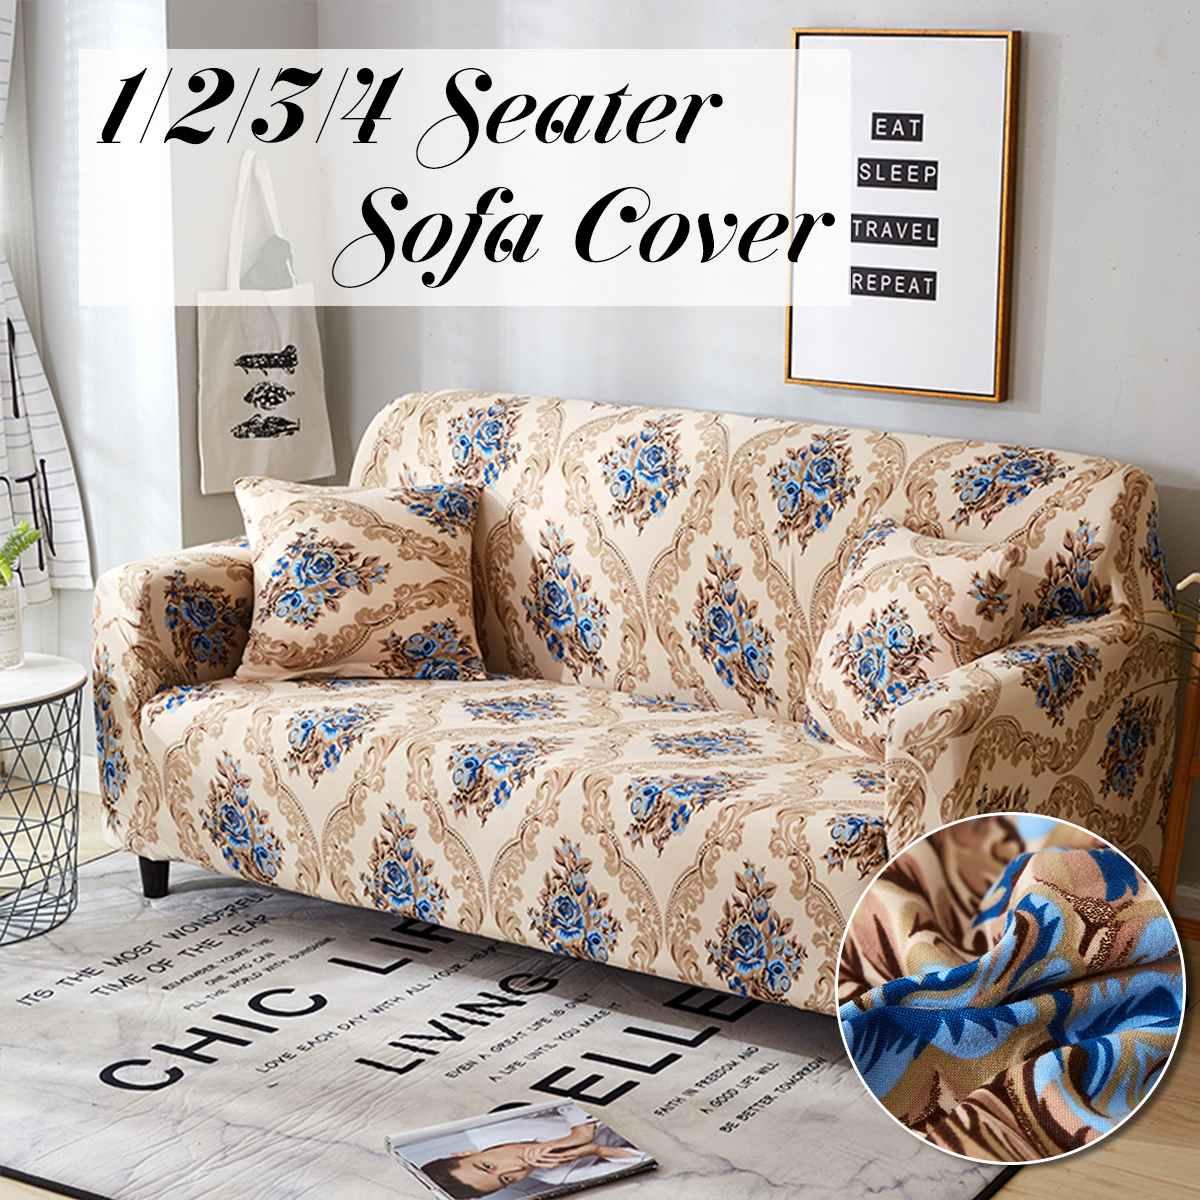 Sapphire Blue 1/2/3/4 Seater Home Soft Elastic Sofa Cover ...